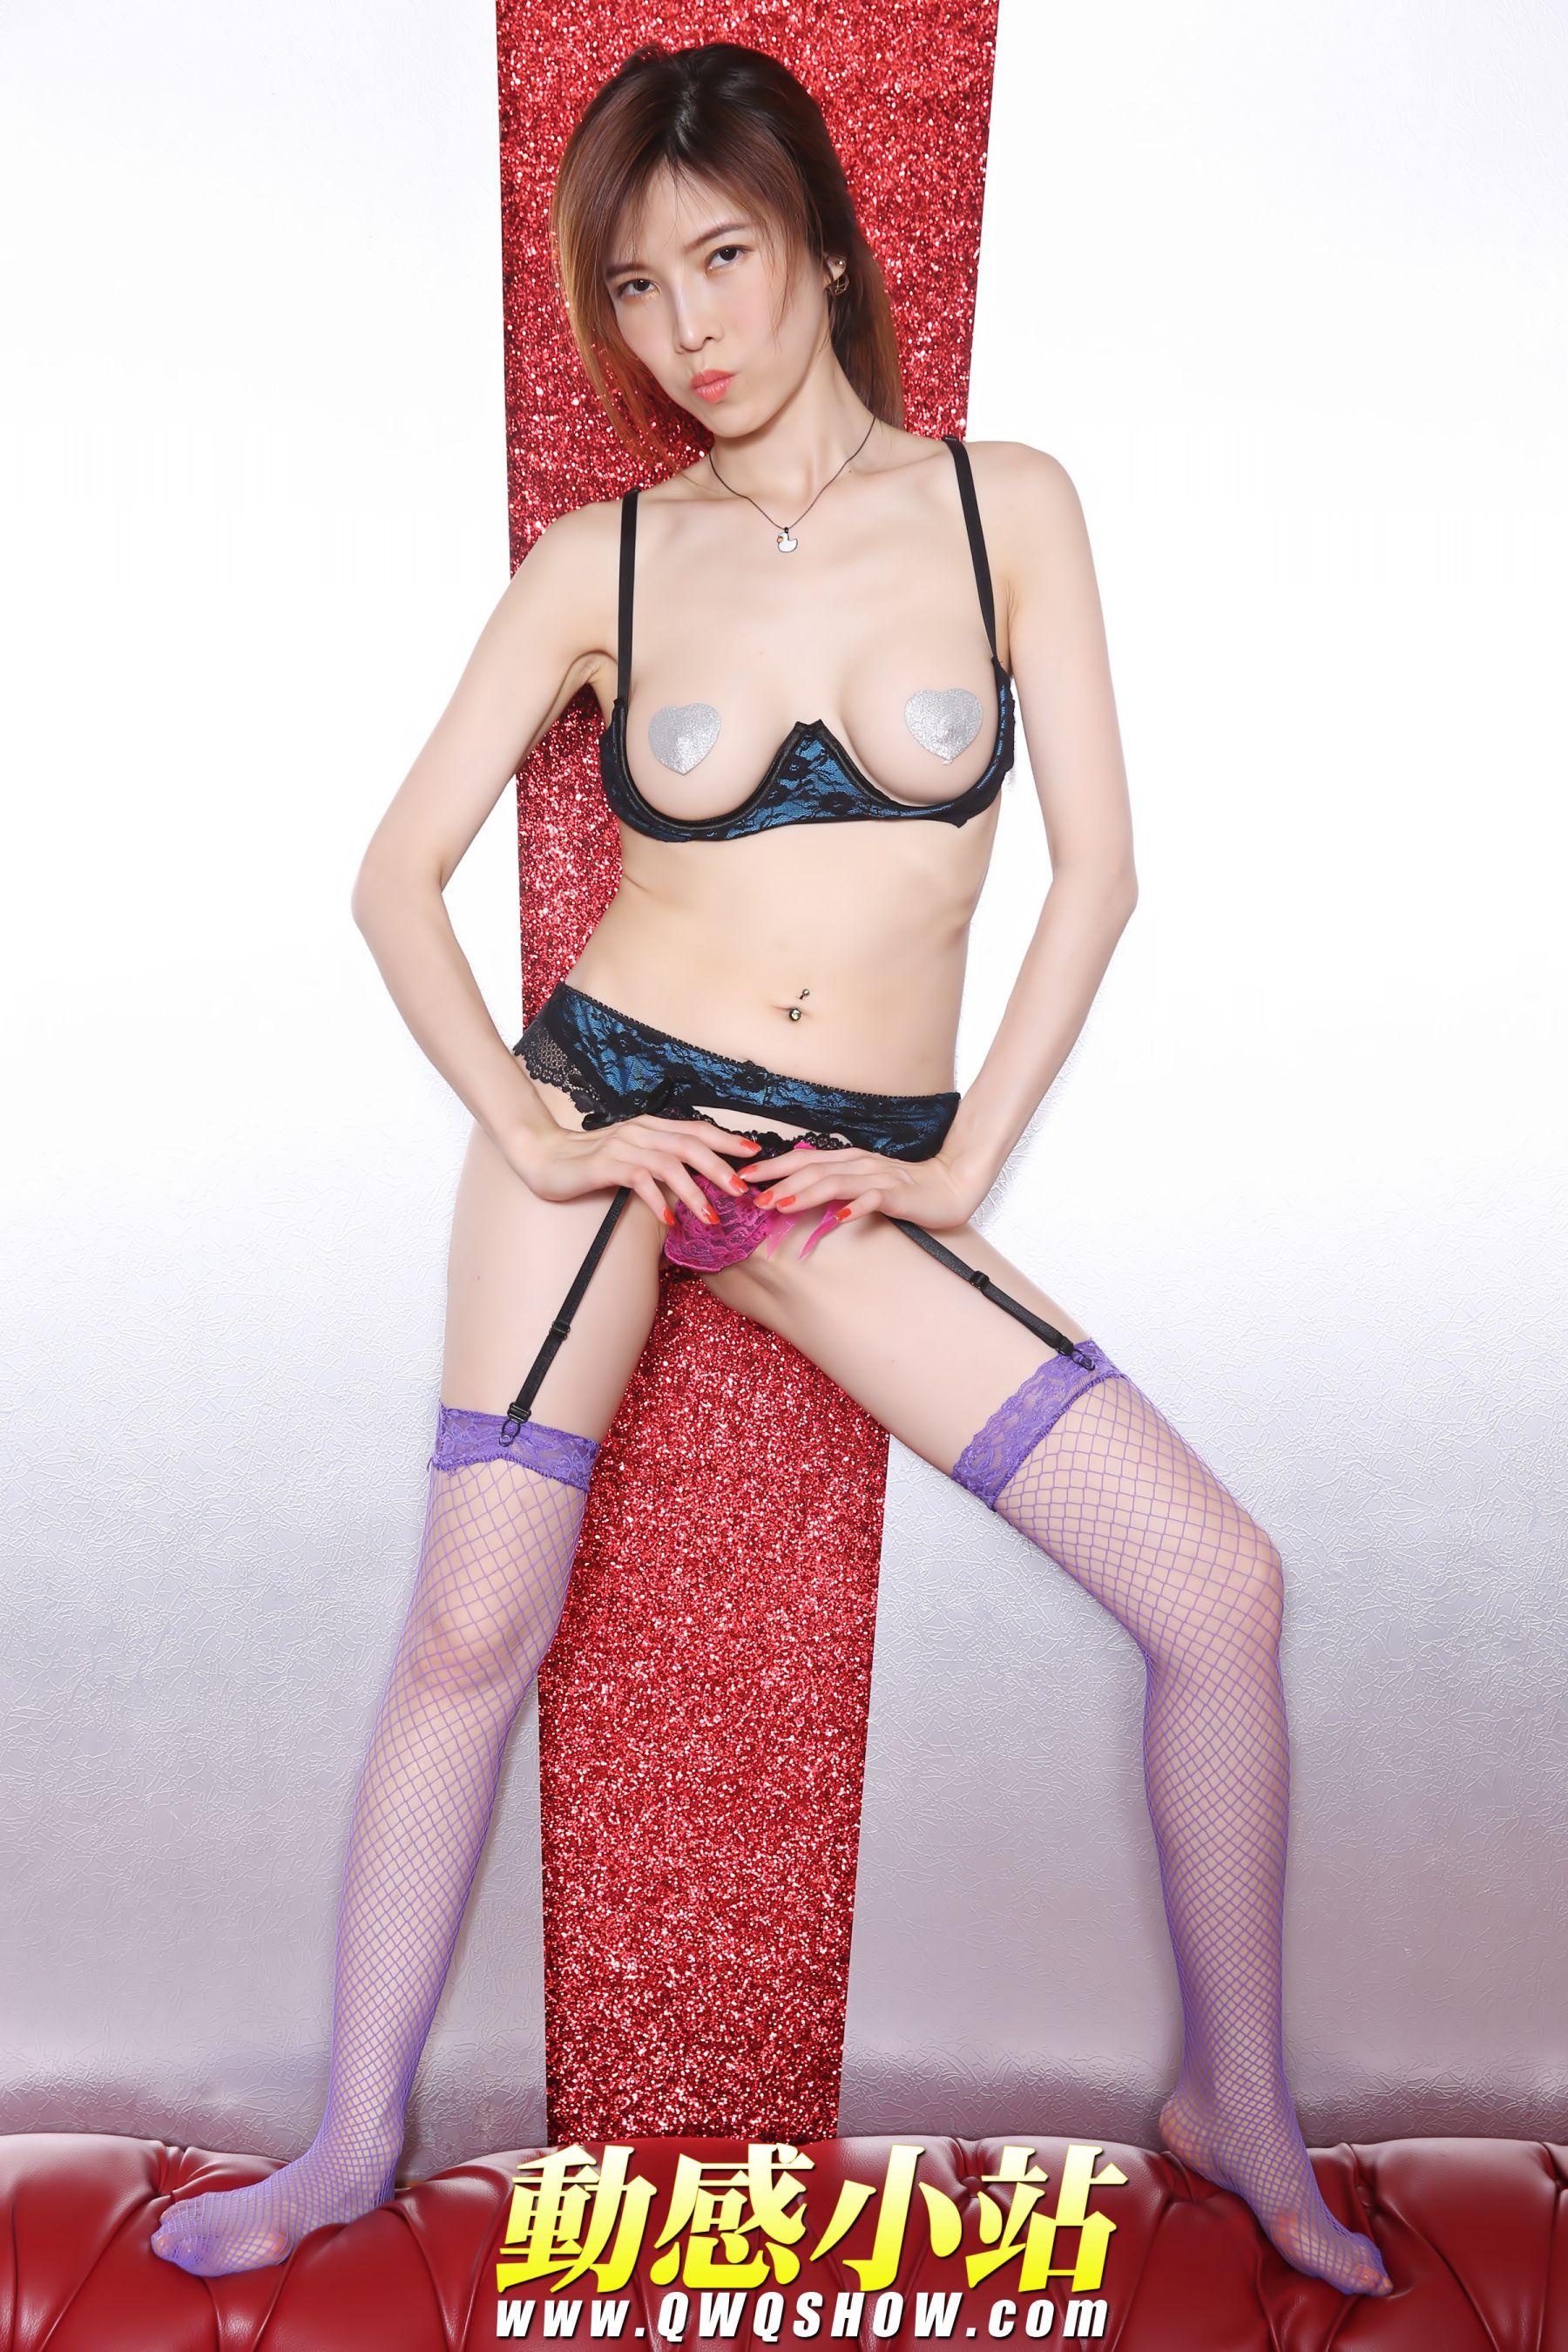 VOL.1668 [动感之星]网袜吊带丝袜:小玲(动感小站小玲,动感之星小玲)高品质写真套图(32P)